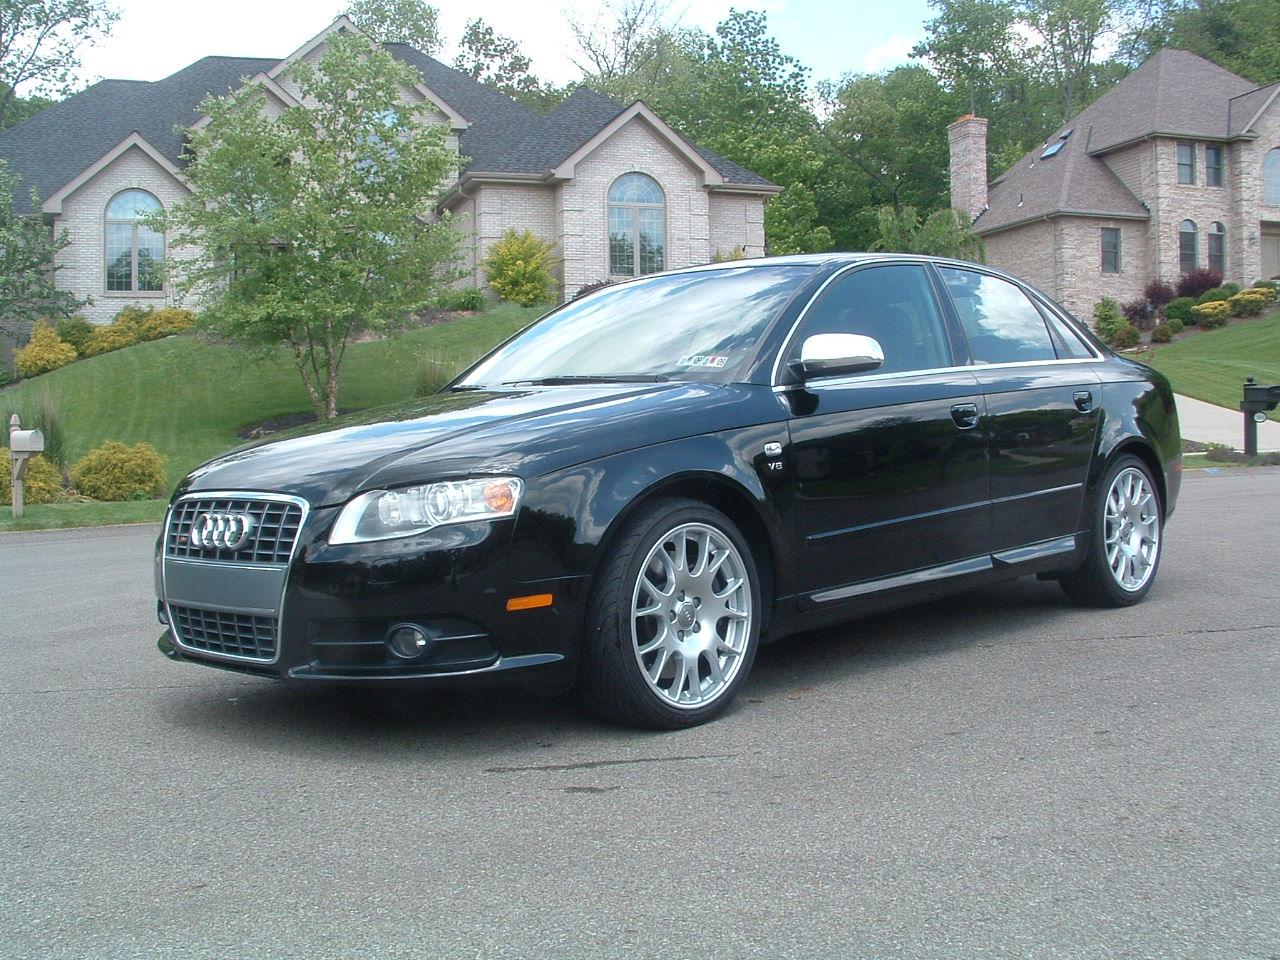 2006 Audi S4 Image 15